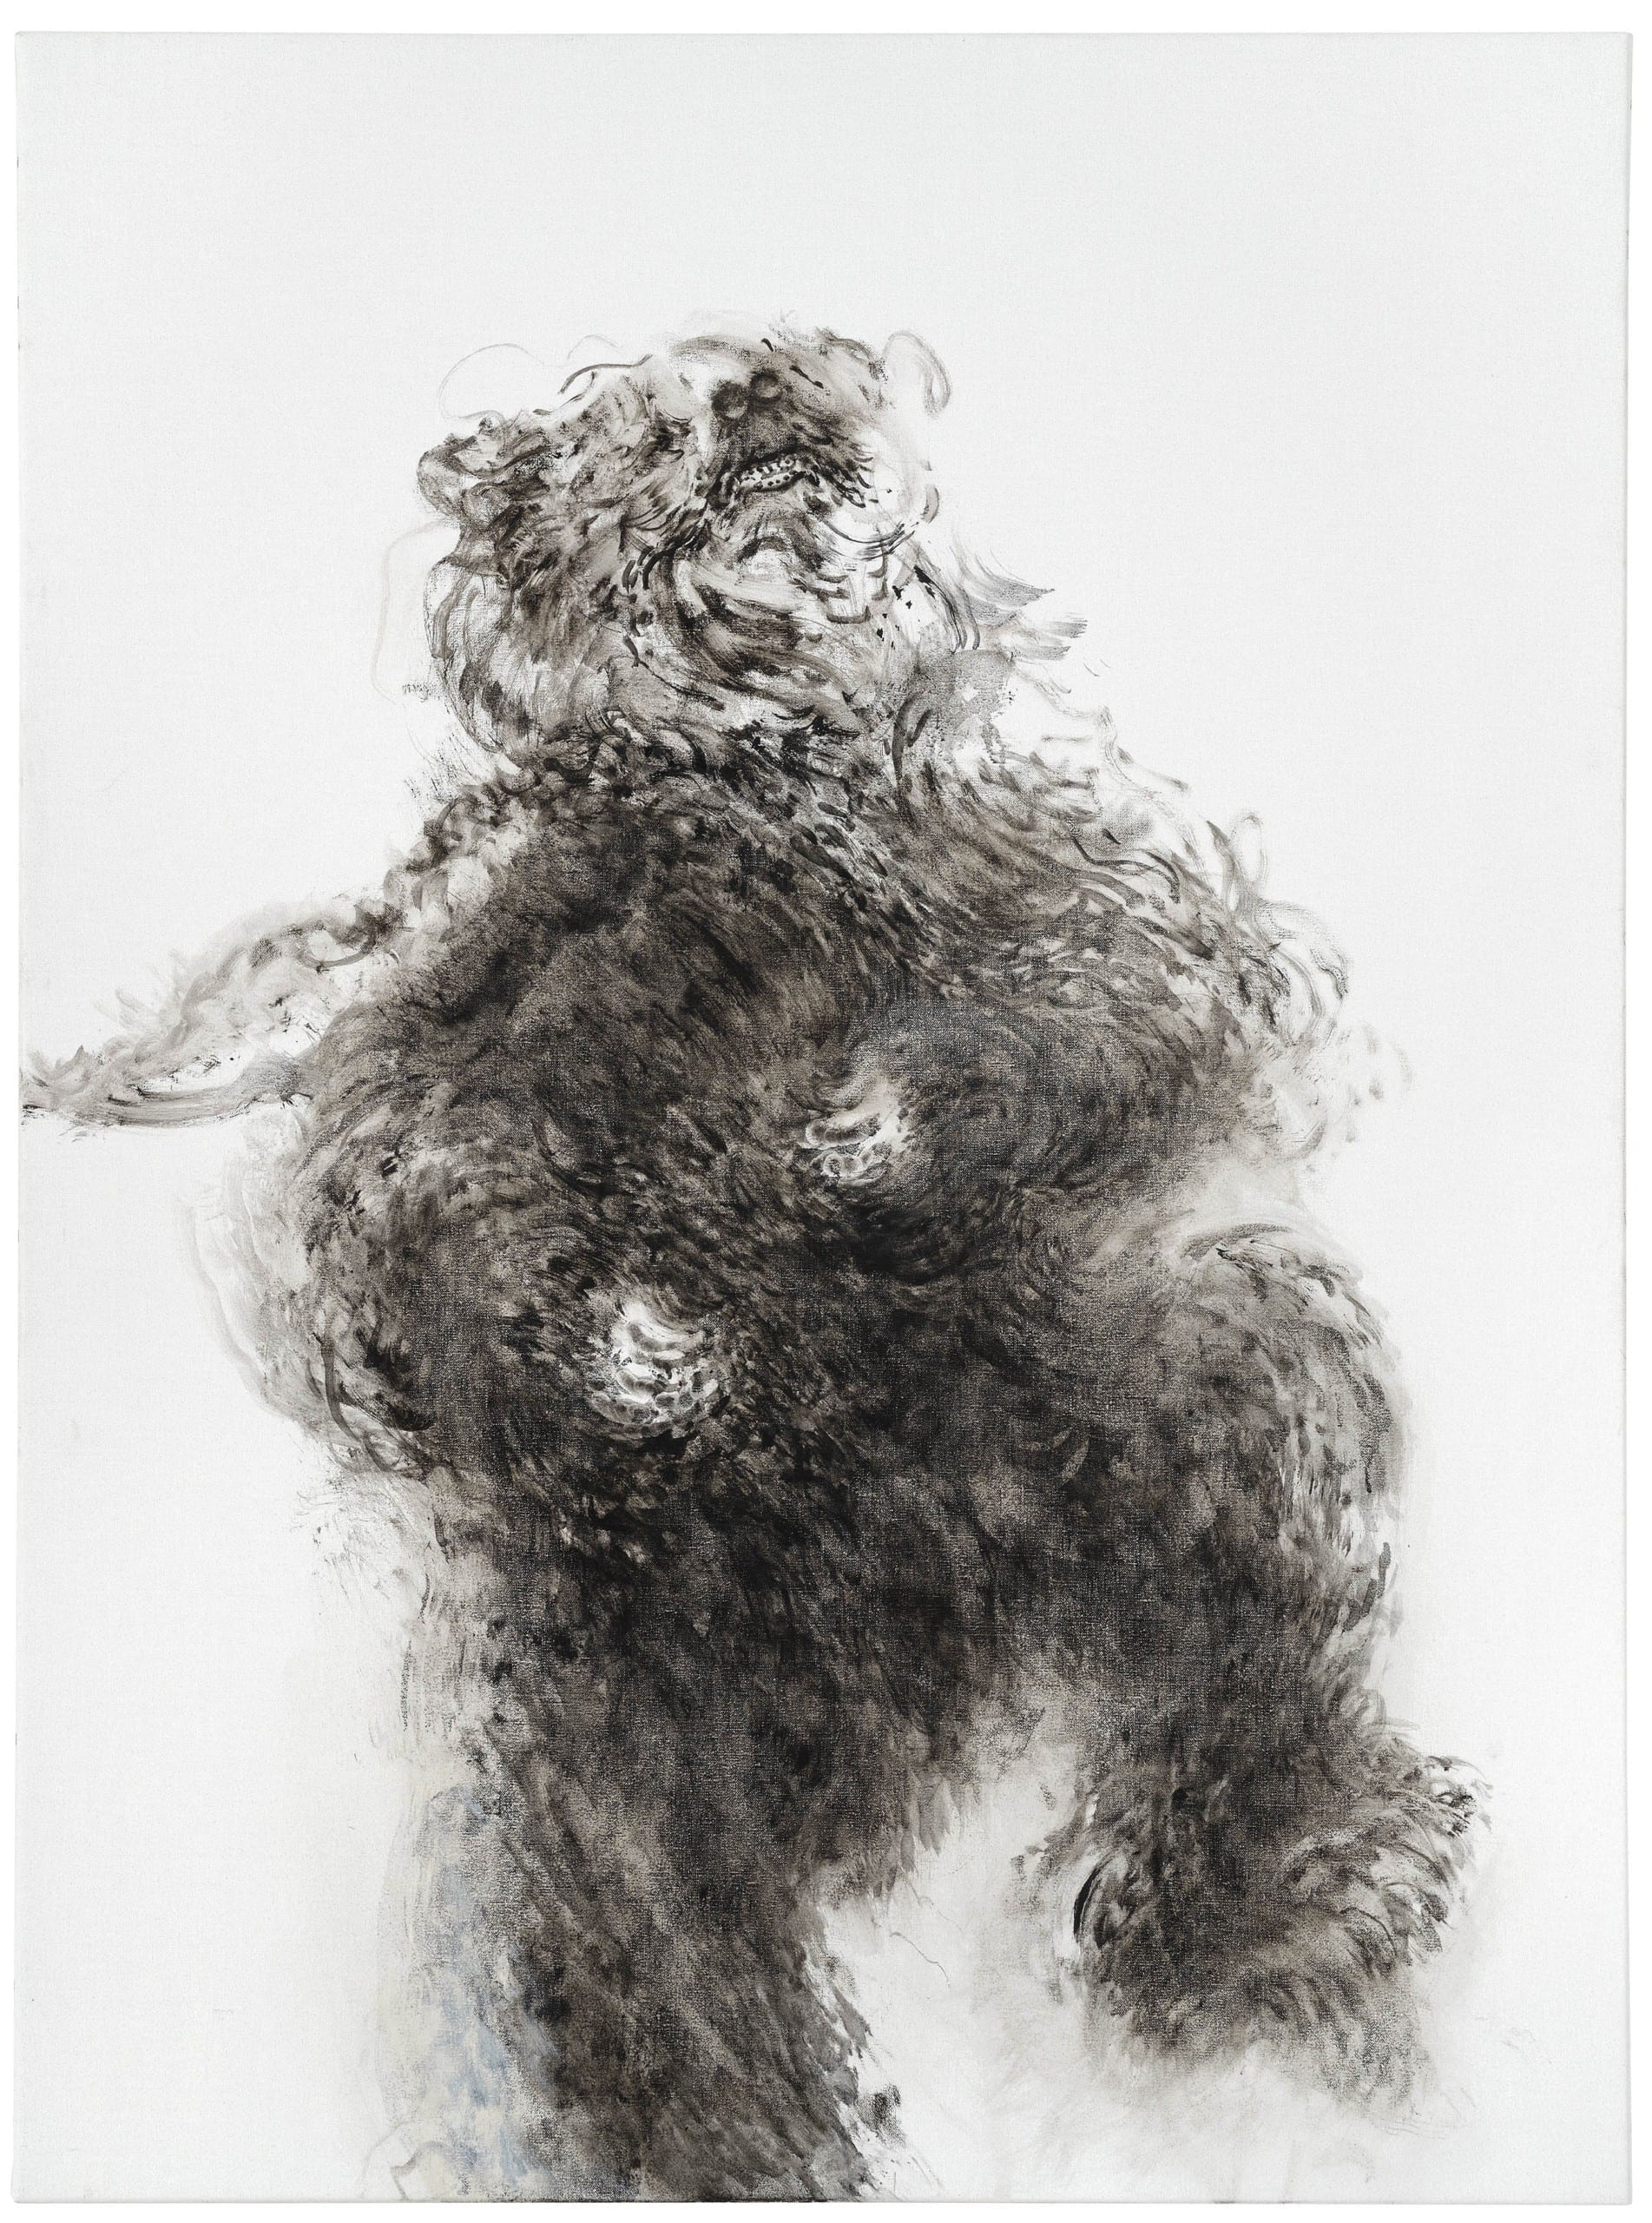 Maggi Hambling, Young dancing bear, oil on canvas, 2019, 48 x 36 inches, courtesy Marlborough, London